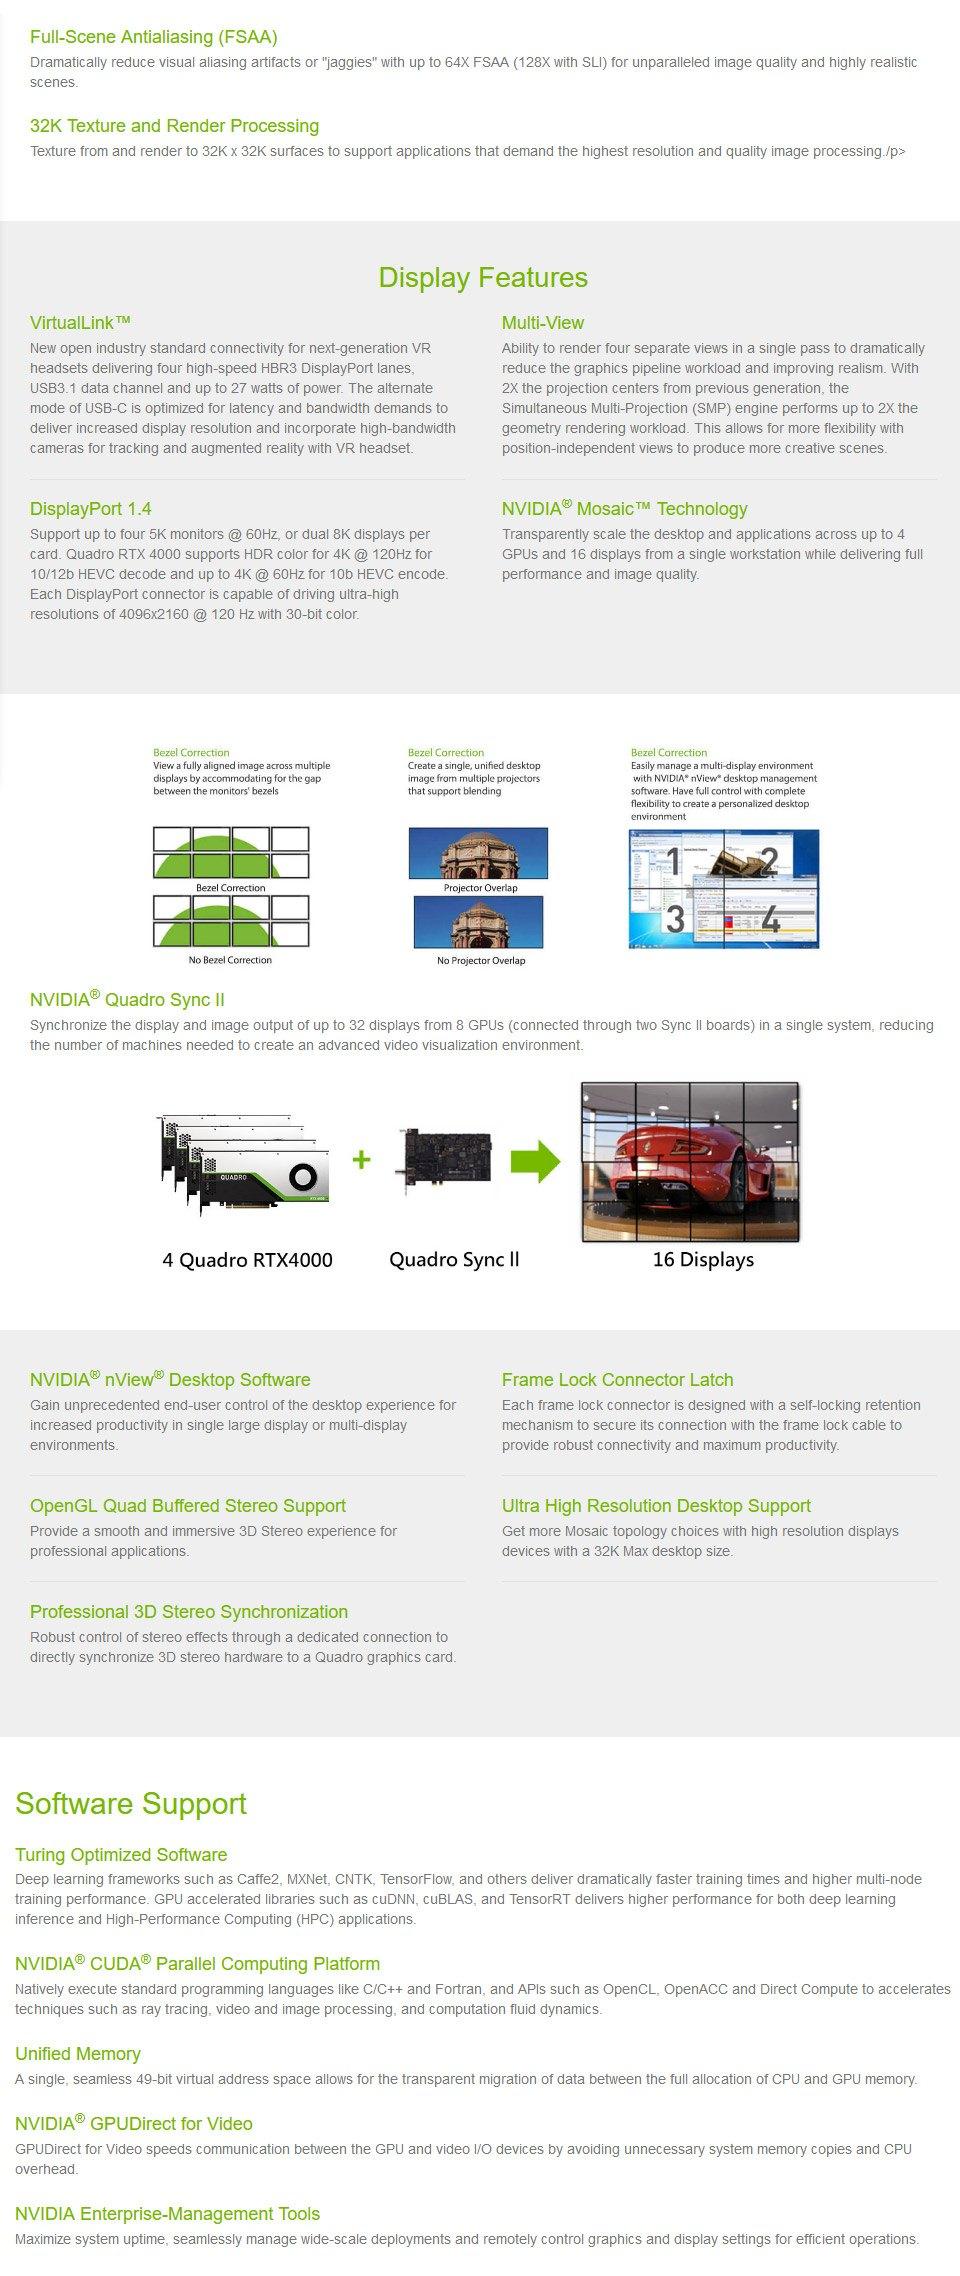 Leadtek Quadro RTX 4000 8GB features 2